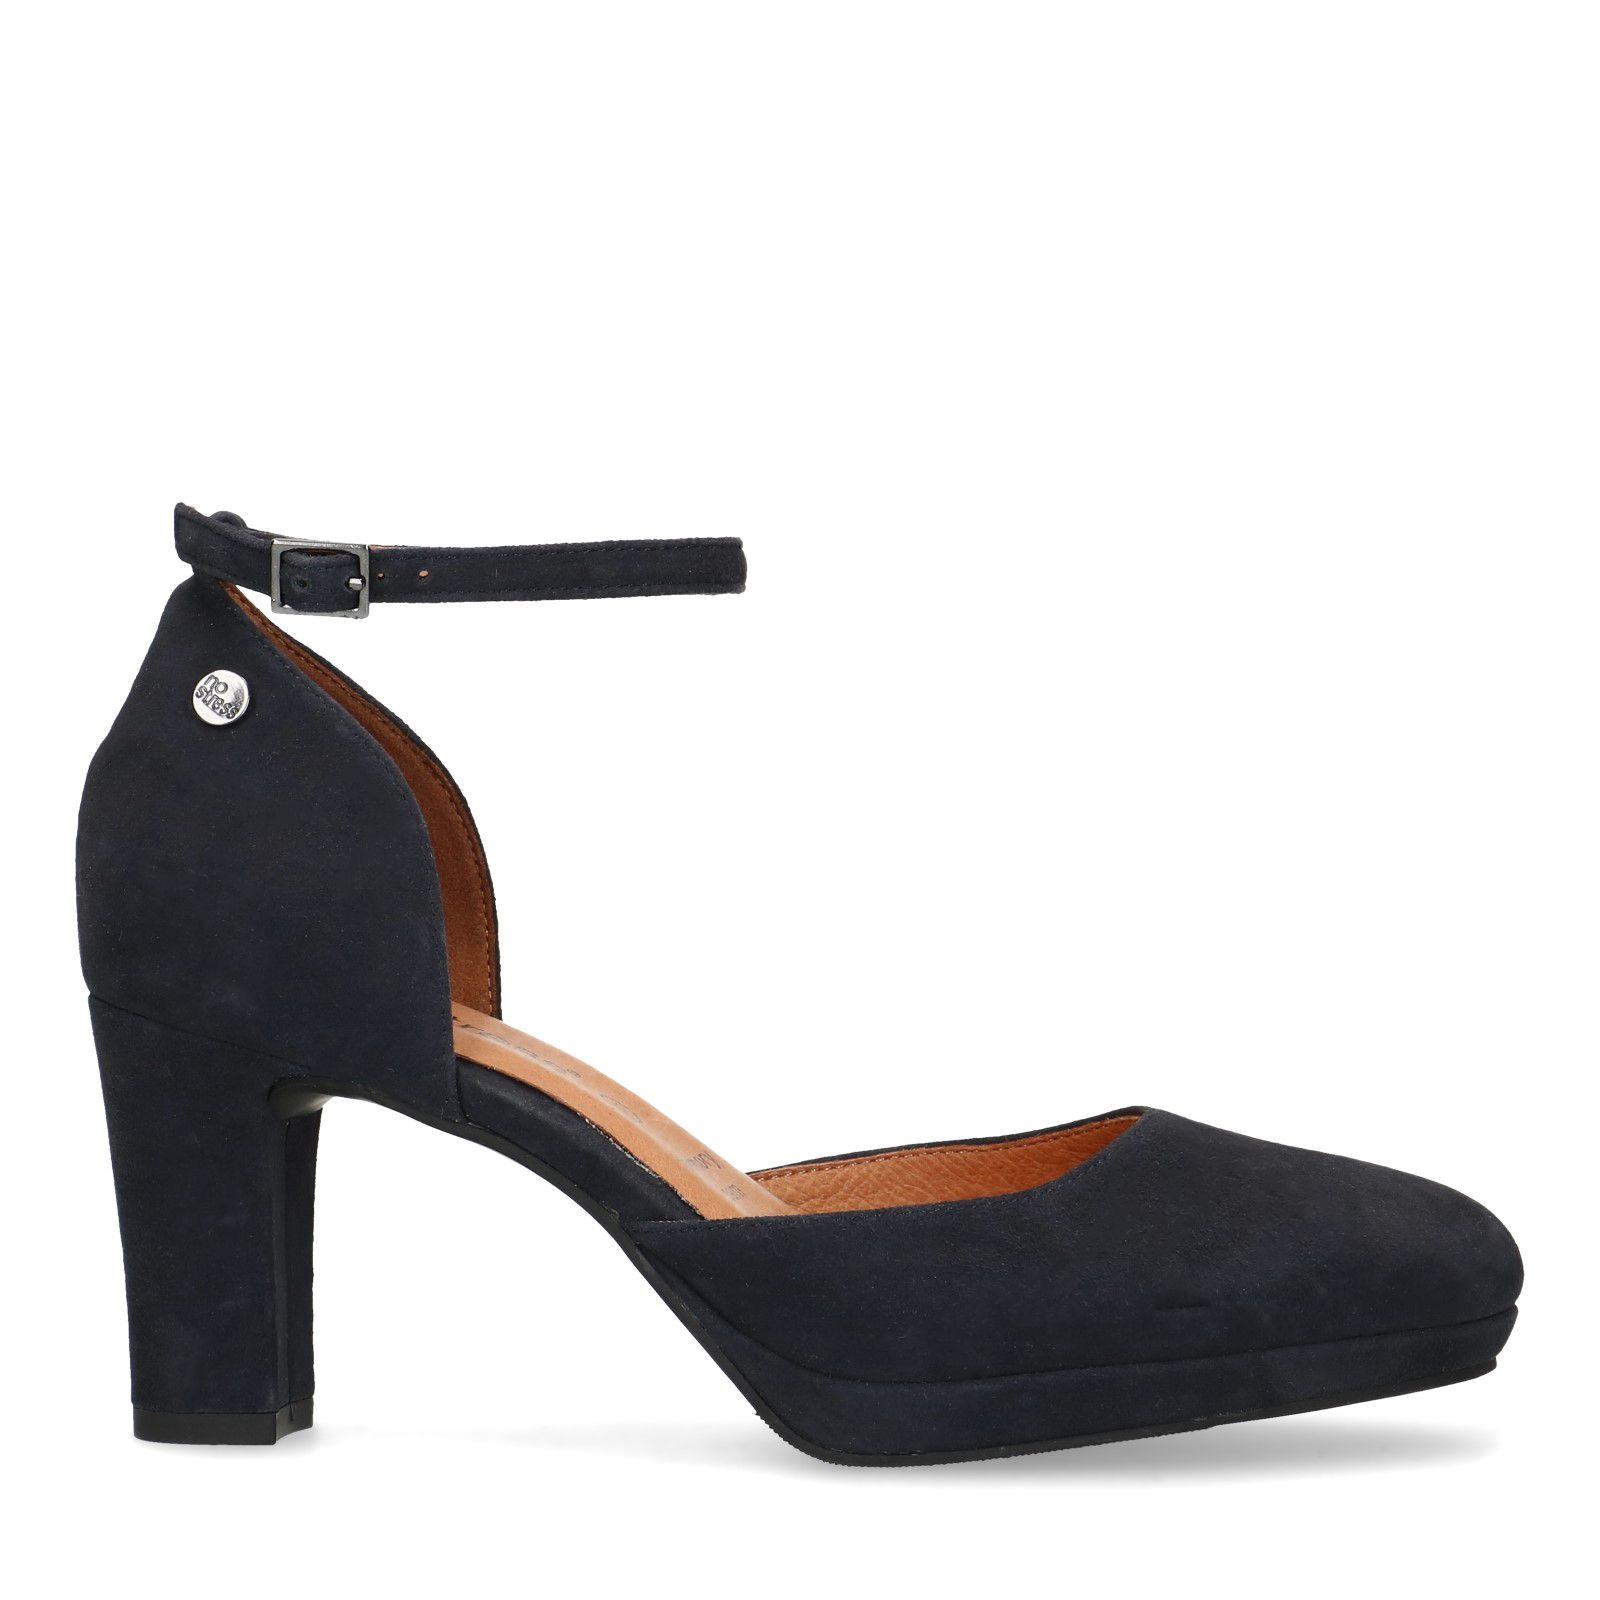 Witte lak sandalen met brede hakken en smal enkelbandje